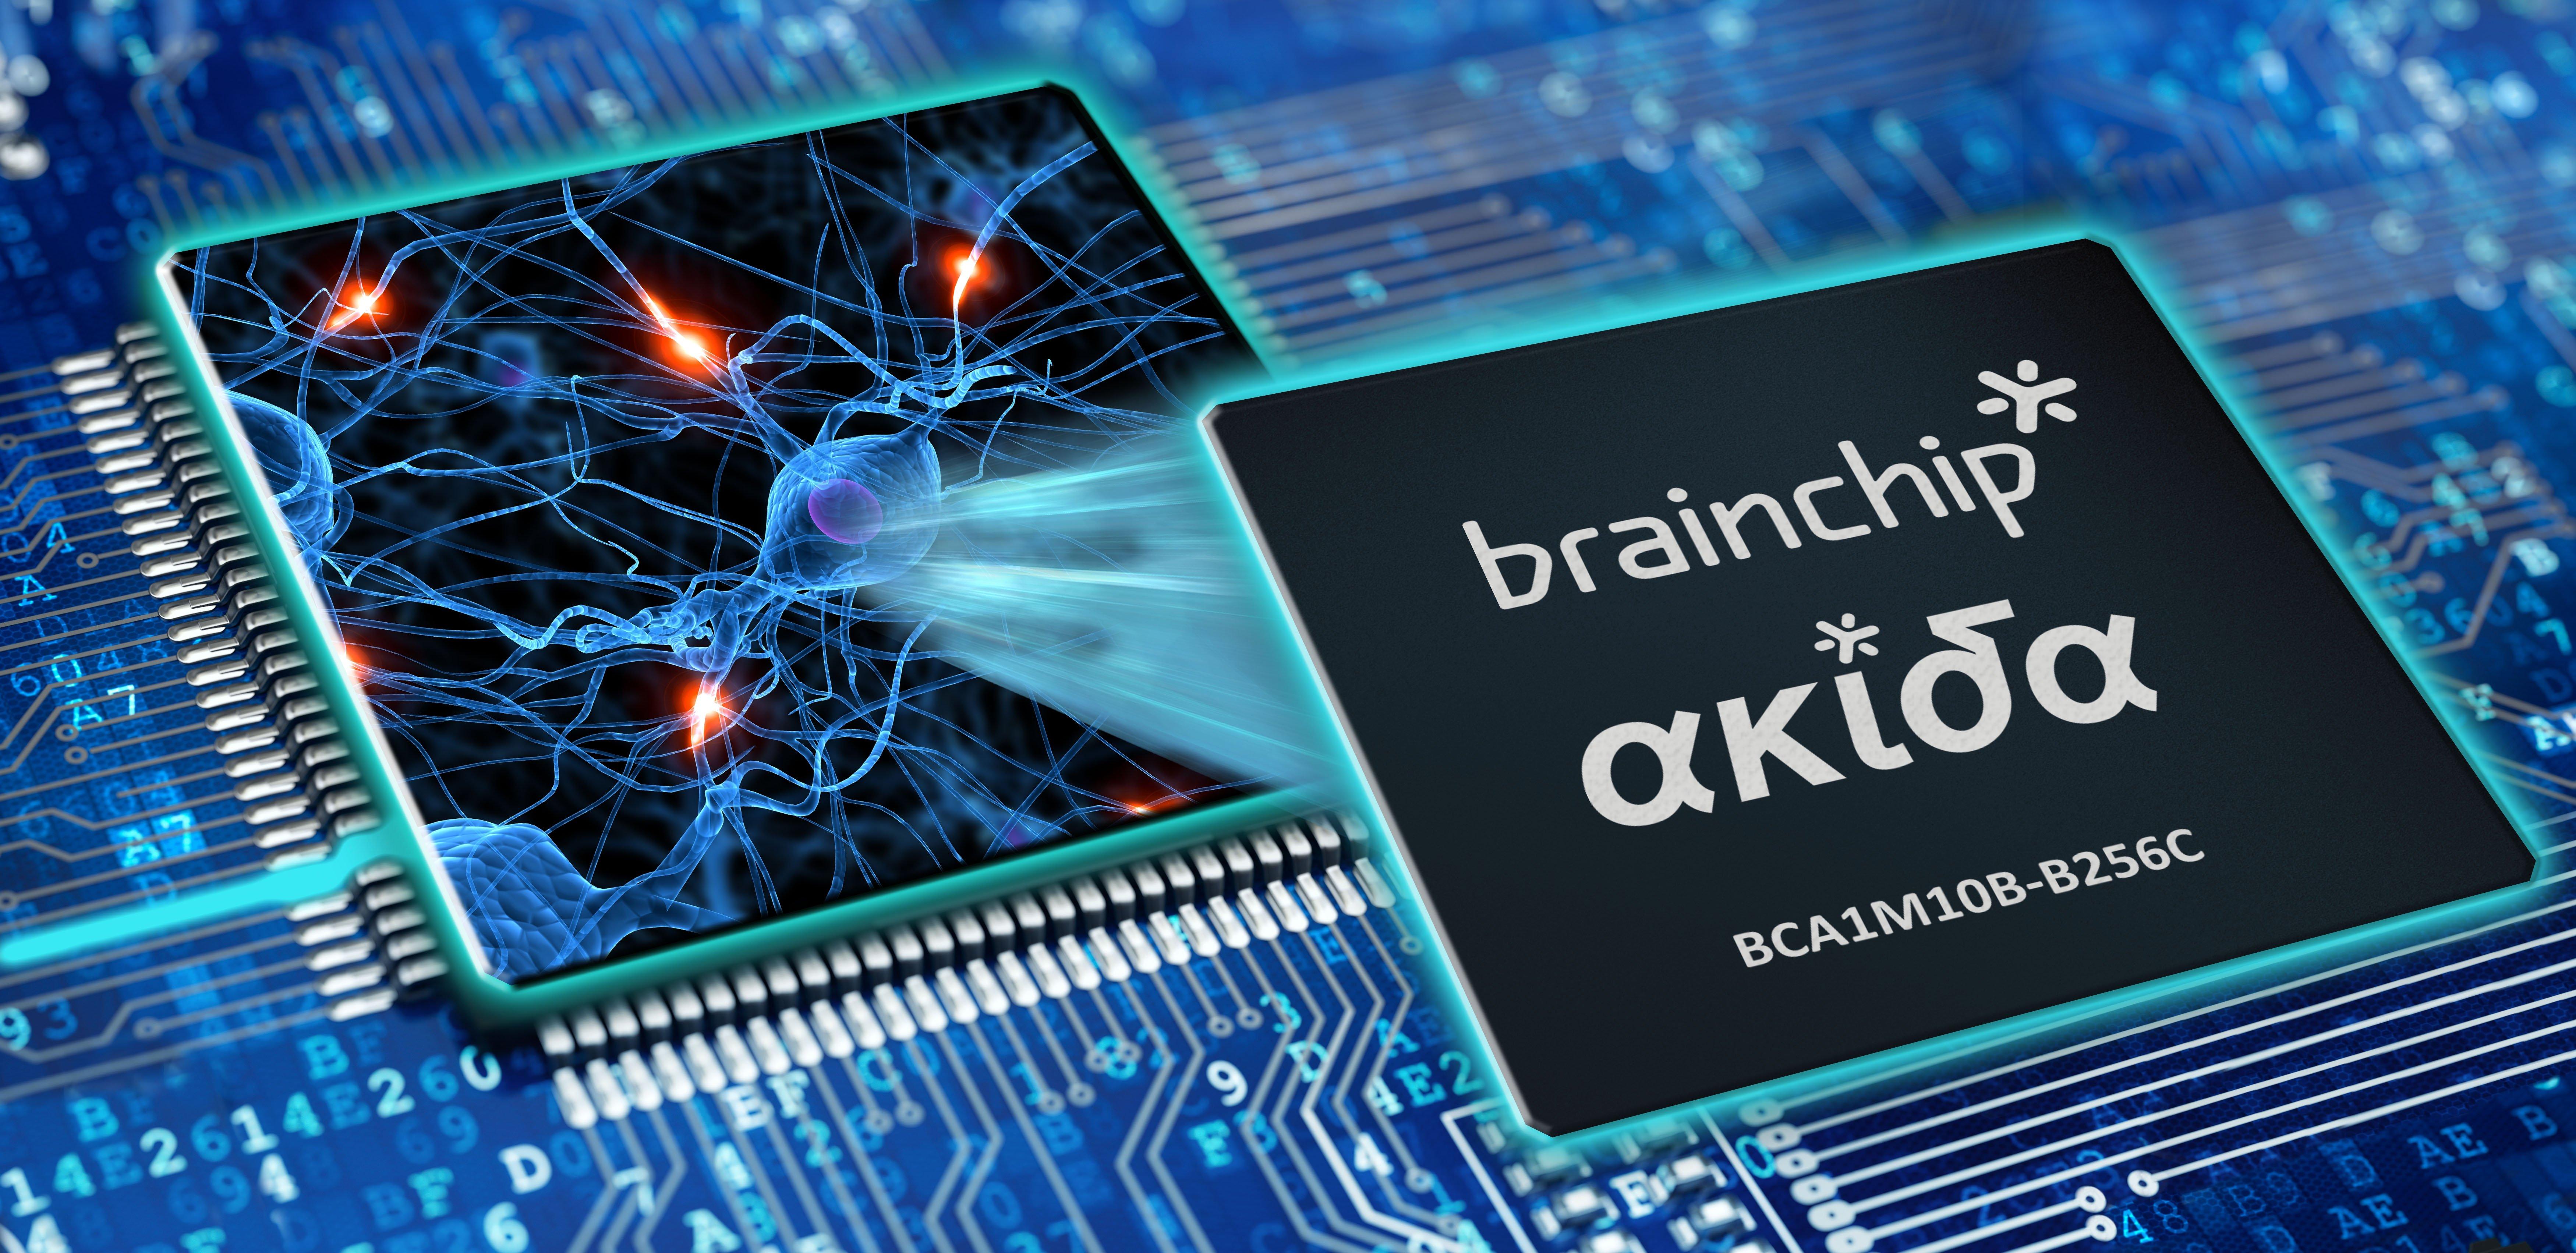 Brainchip To Release Biologically Inspired Neurmorphic